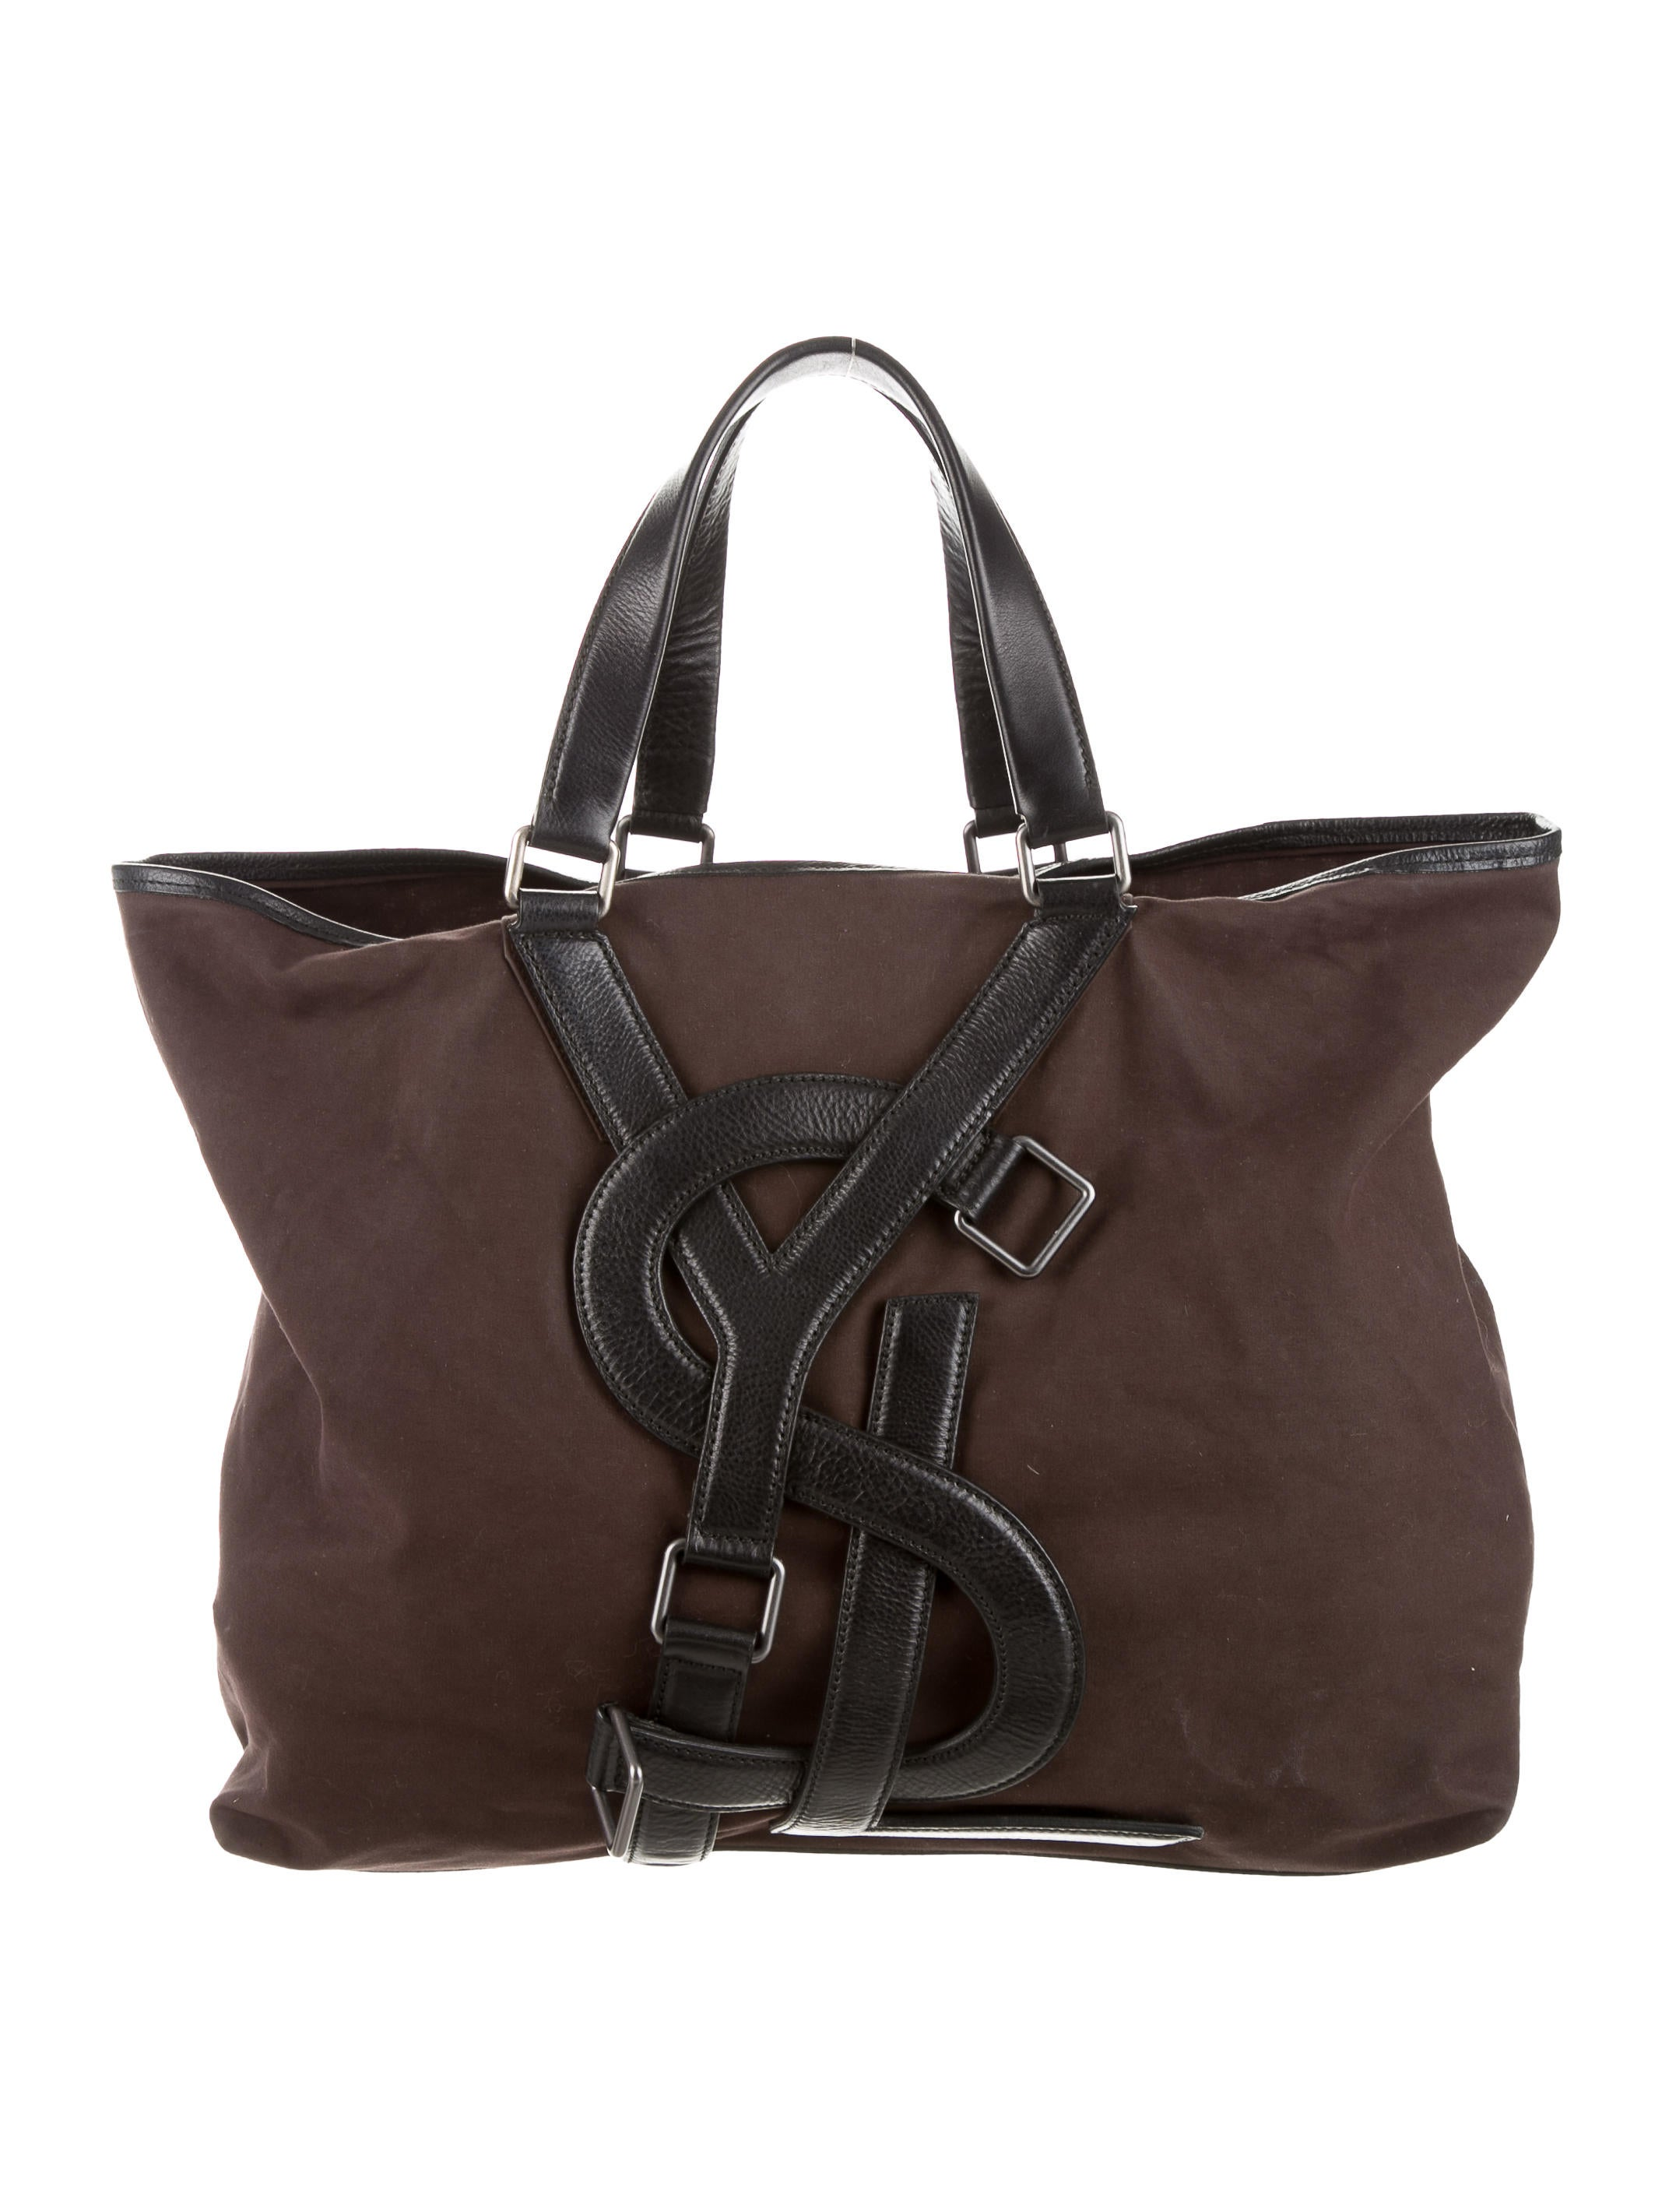 ac7d669fb6 Yves Saint Laurent Vavin Tote - Handbags - YVE45715